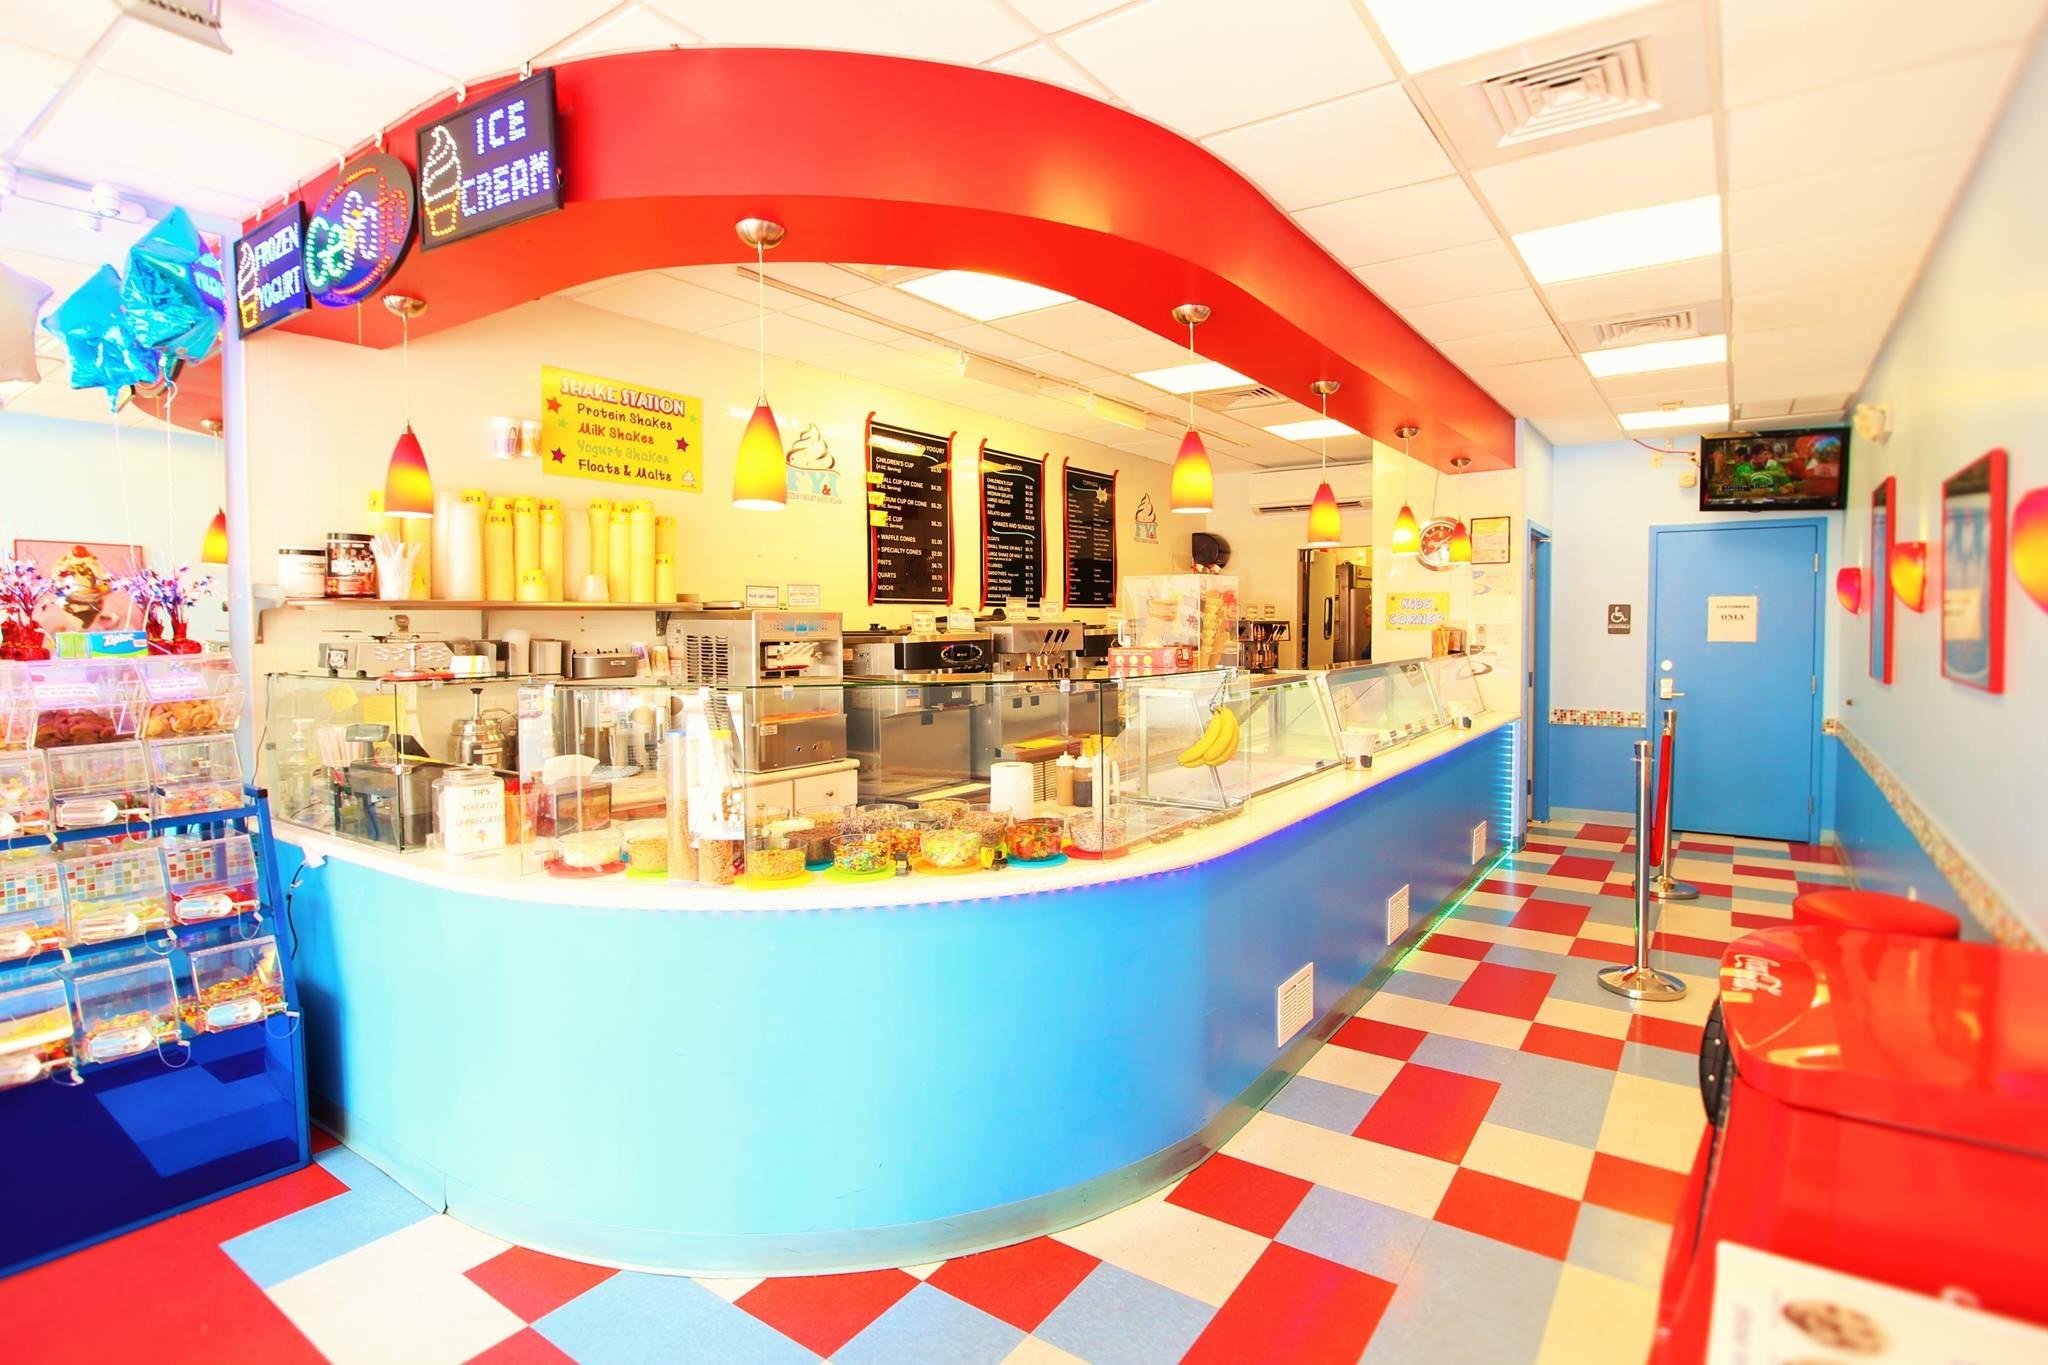 Delray Beach's favorite ice cream and frozen yogurt location! Finding delicious